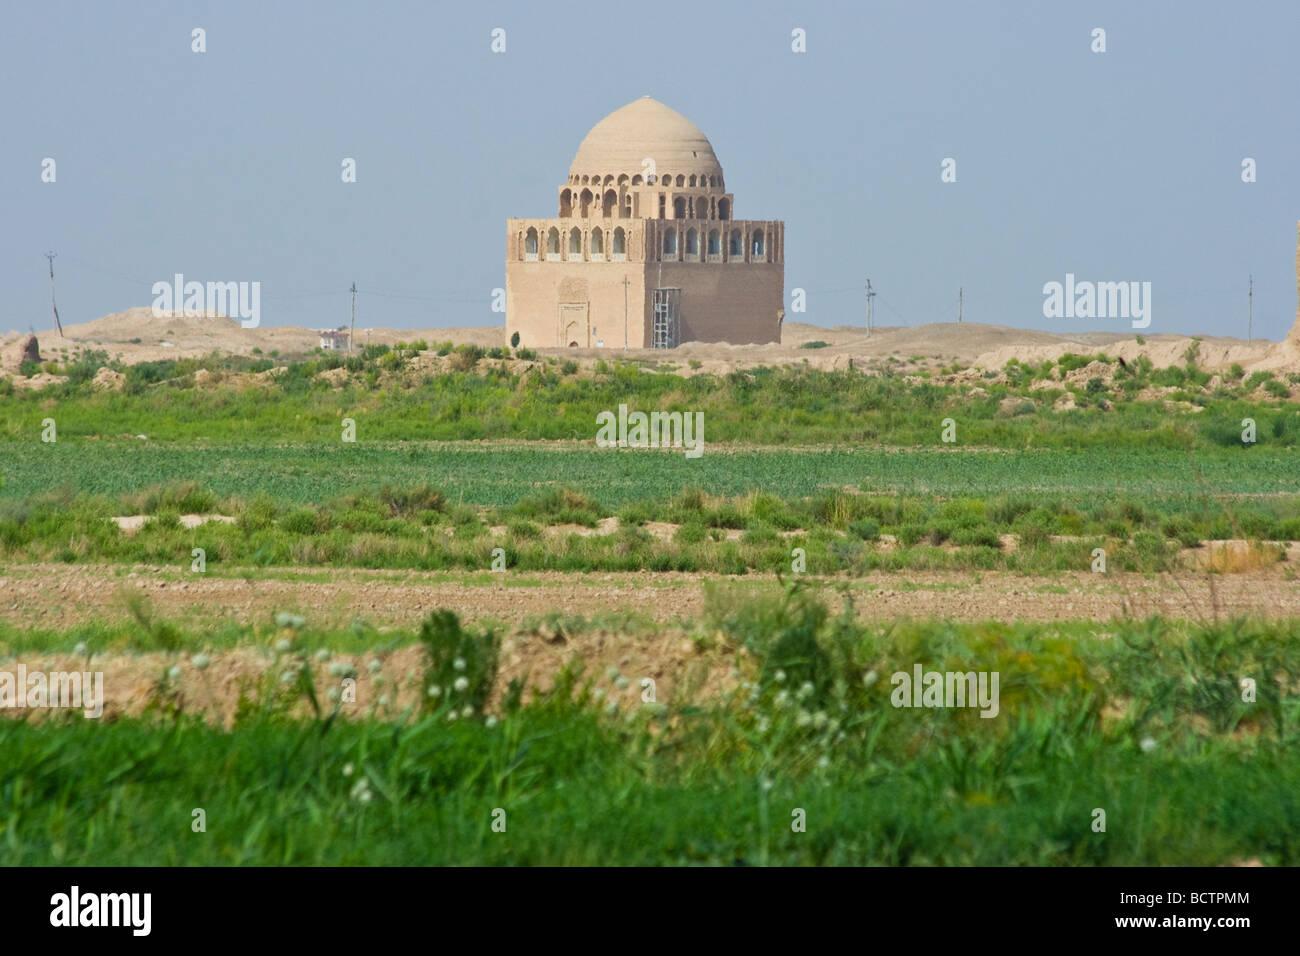 Mausoleum of Sultan Ahmad Sanjar in the Ruins of Merv in Turkmenistan Stock Photo